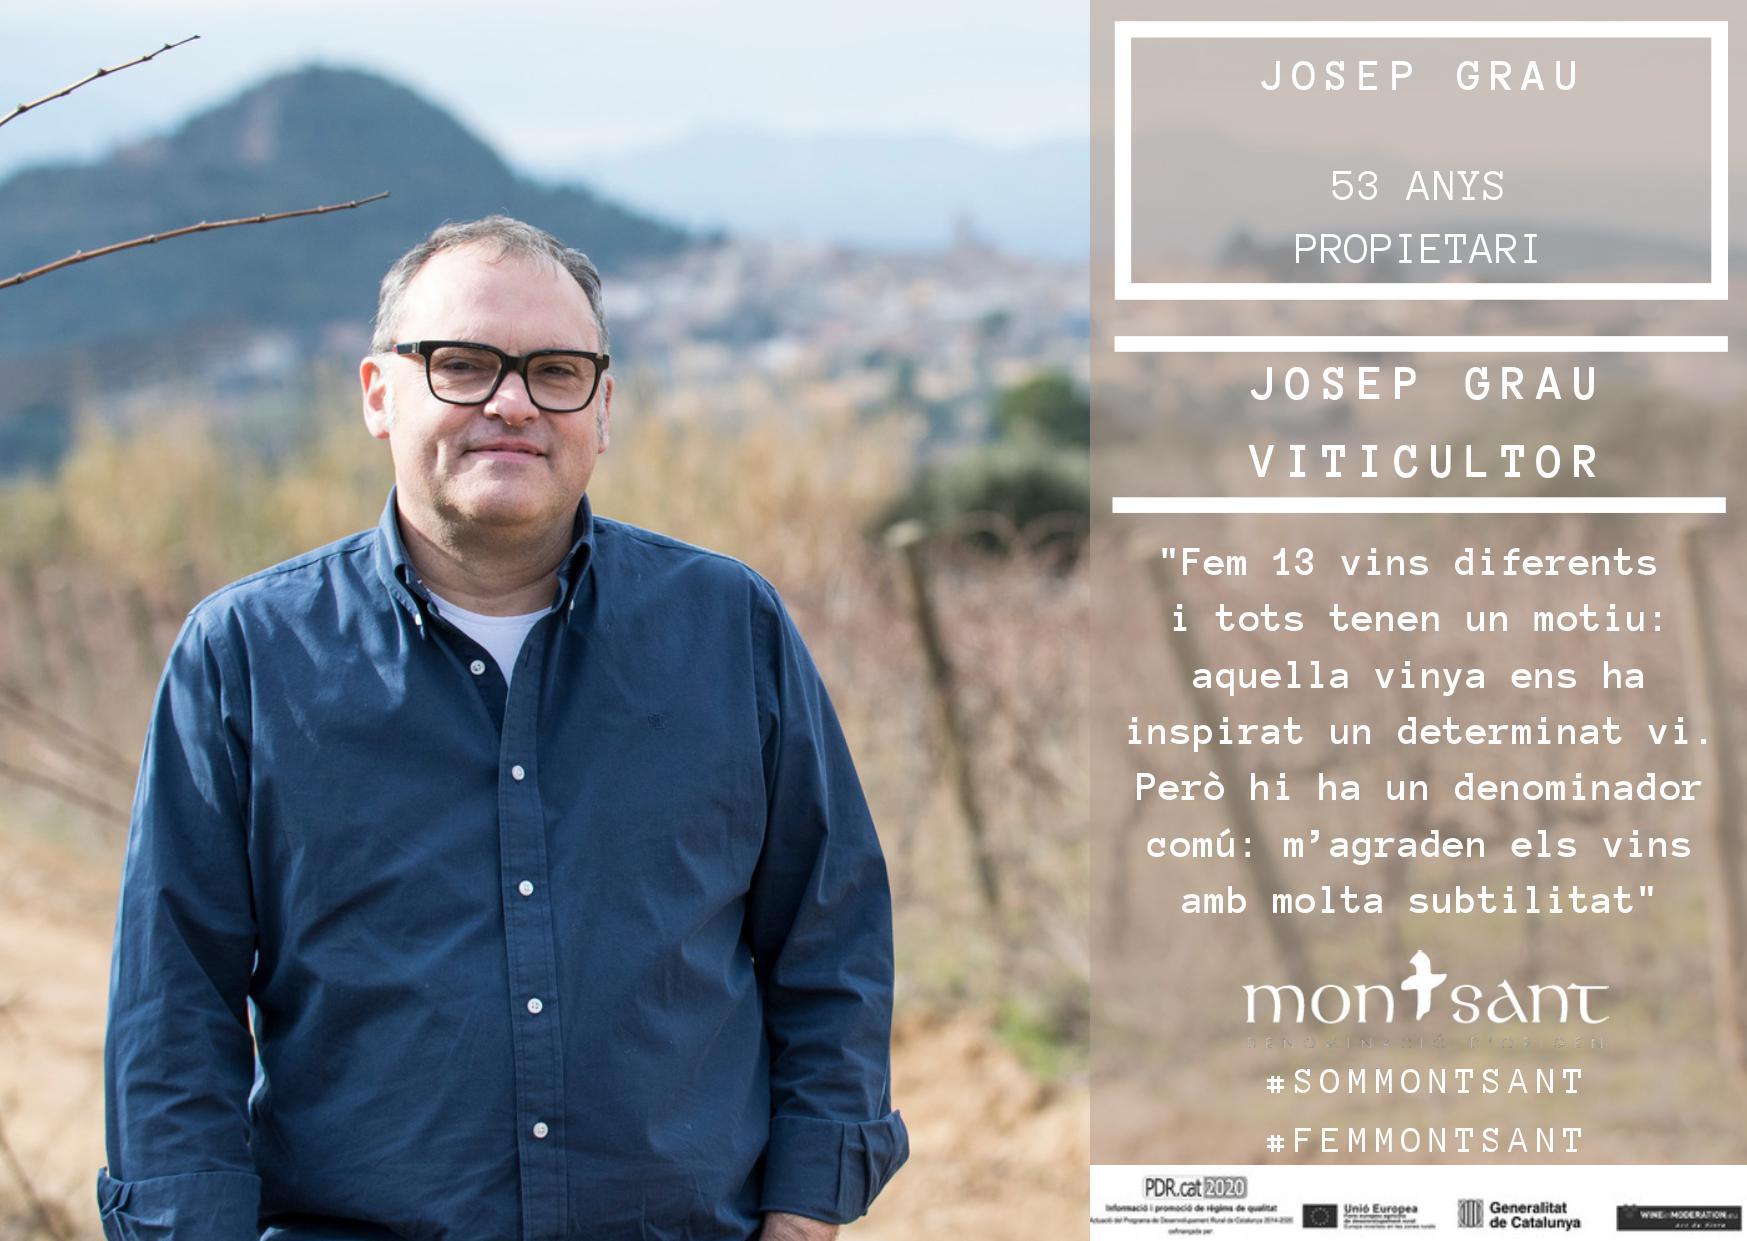 domontsant_josep_grau_viticultor